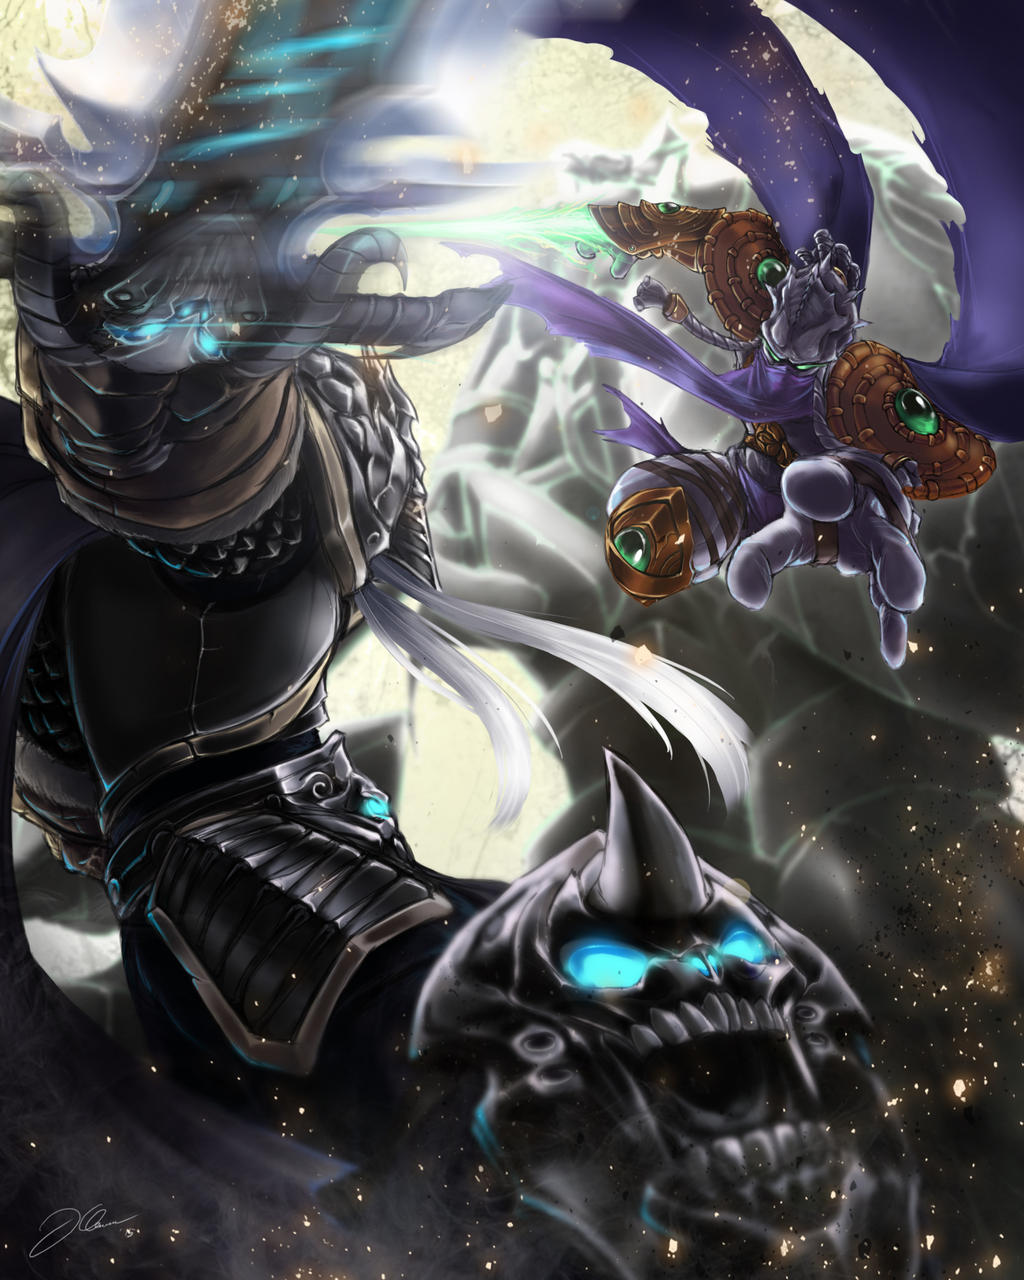 The Fallen King and The Dark Templar